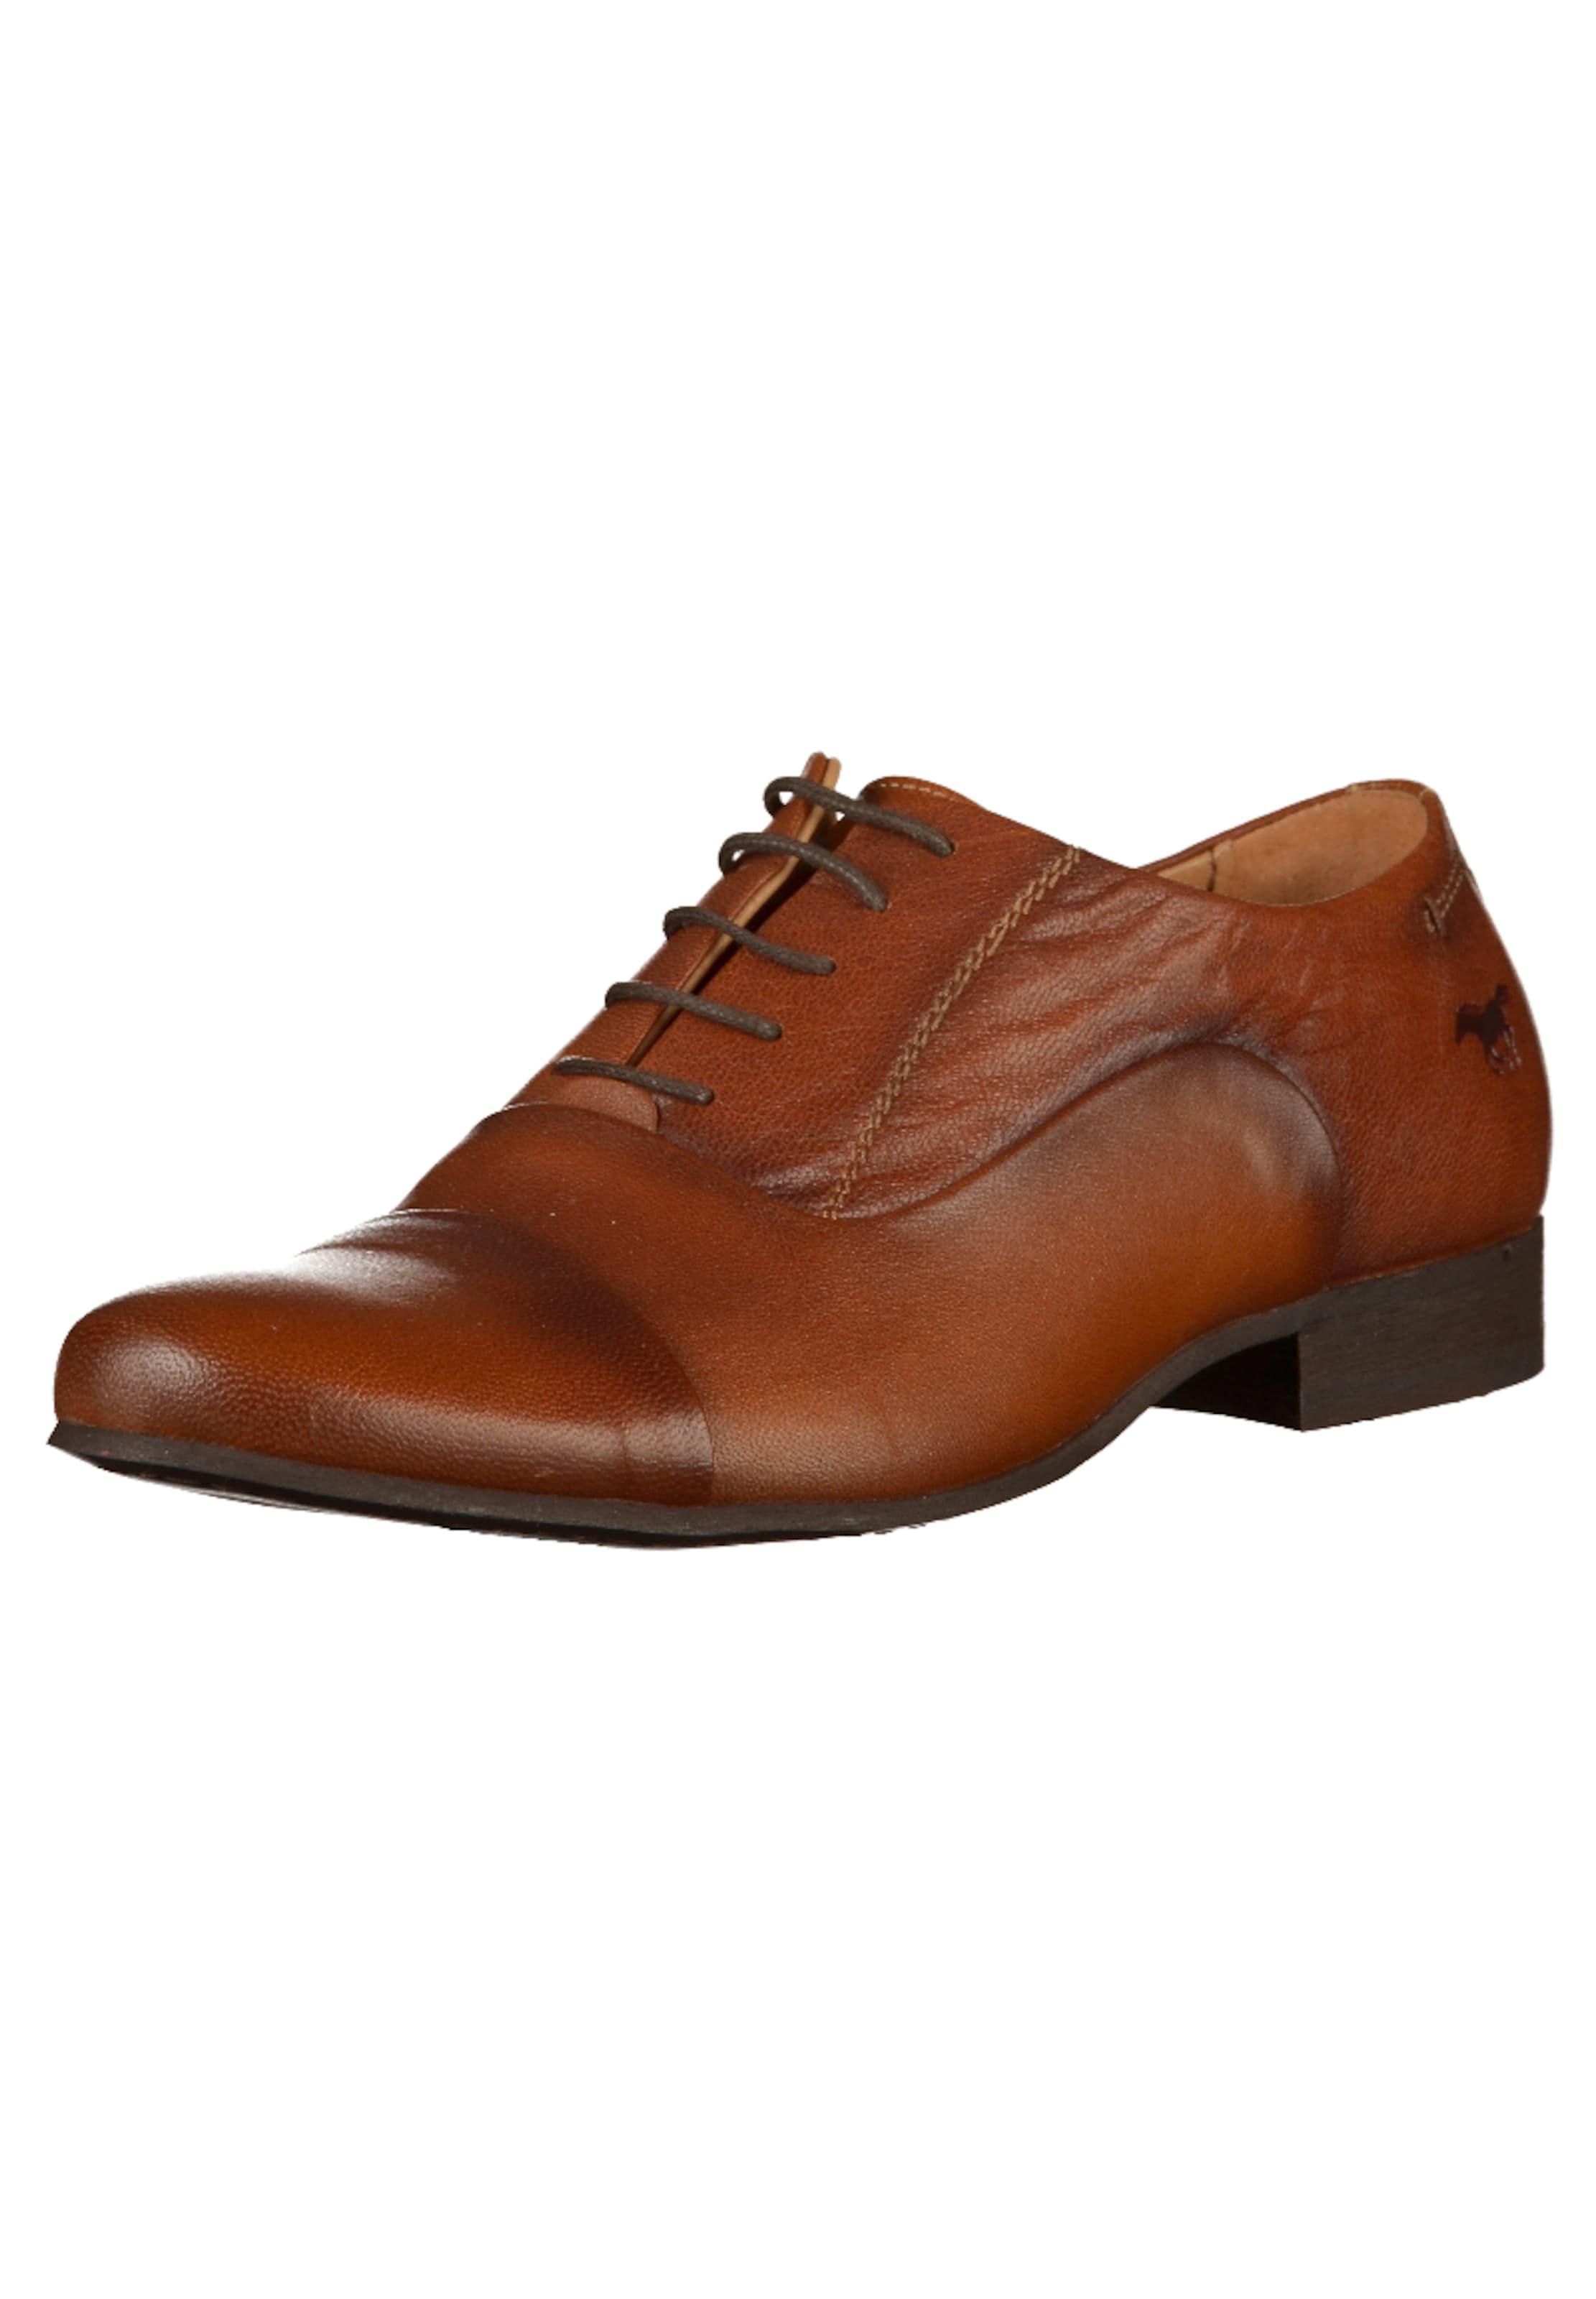 MUSTANG Businessschuhe Verschleißfeste billige Schuhe Hohe Qualität